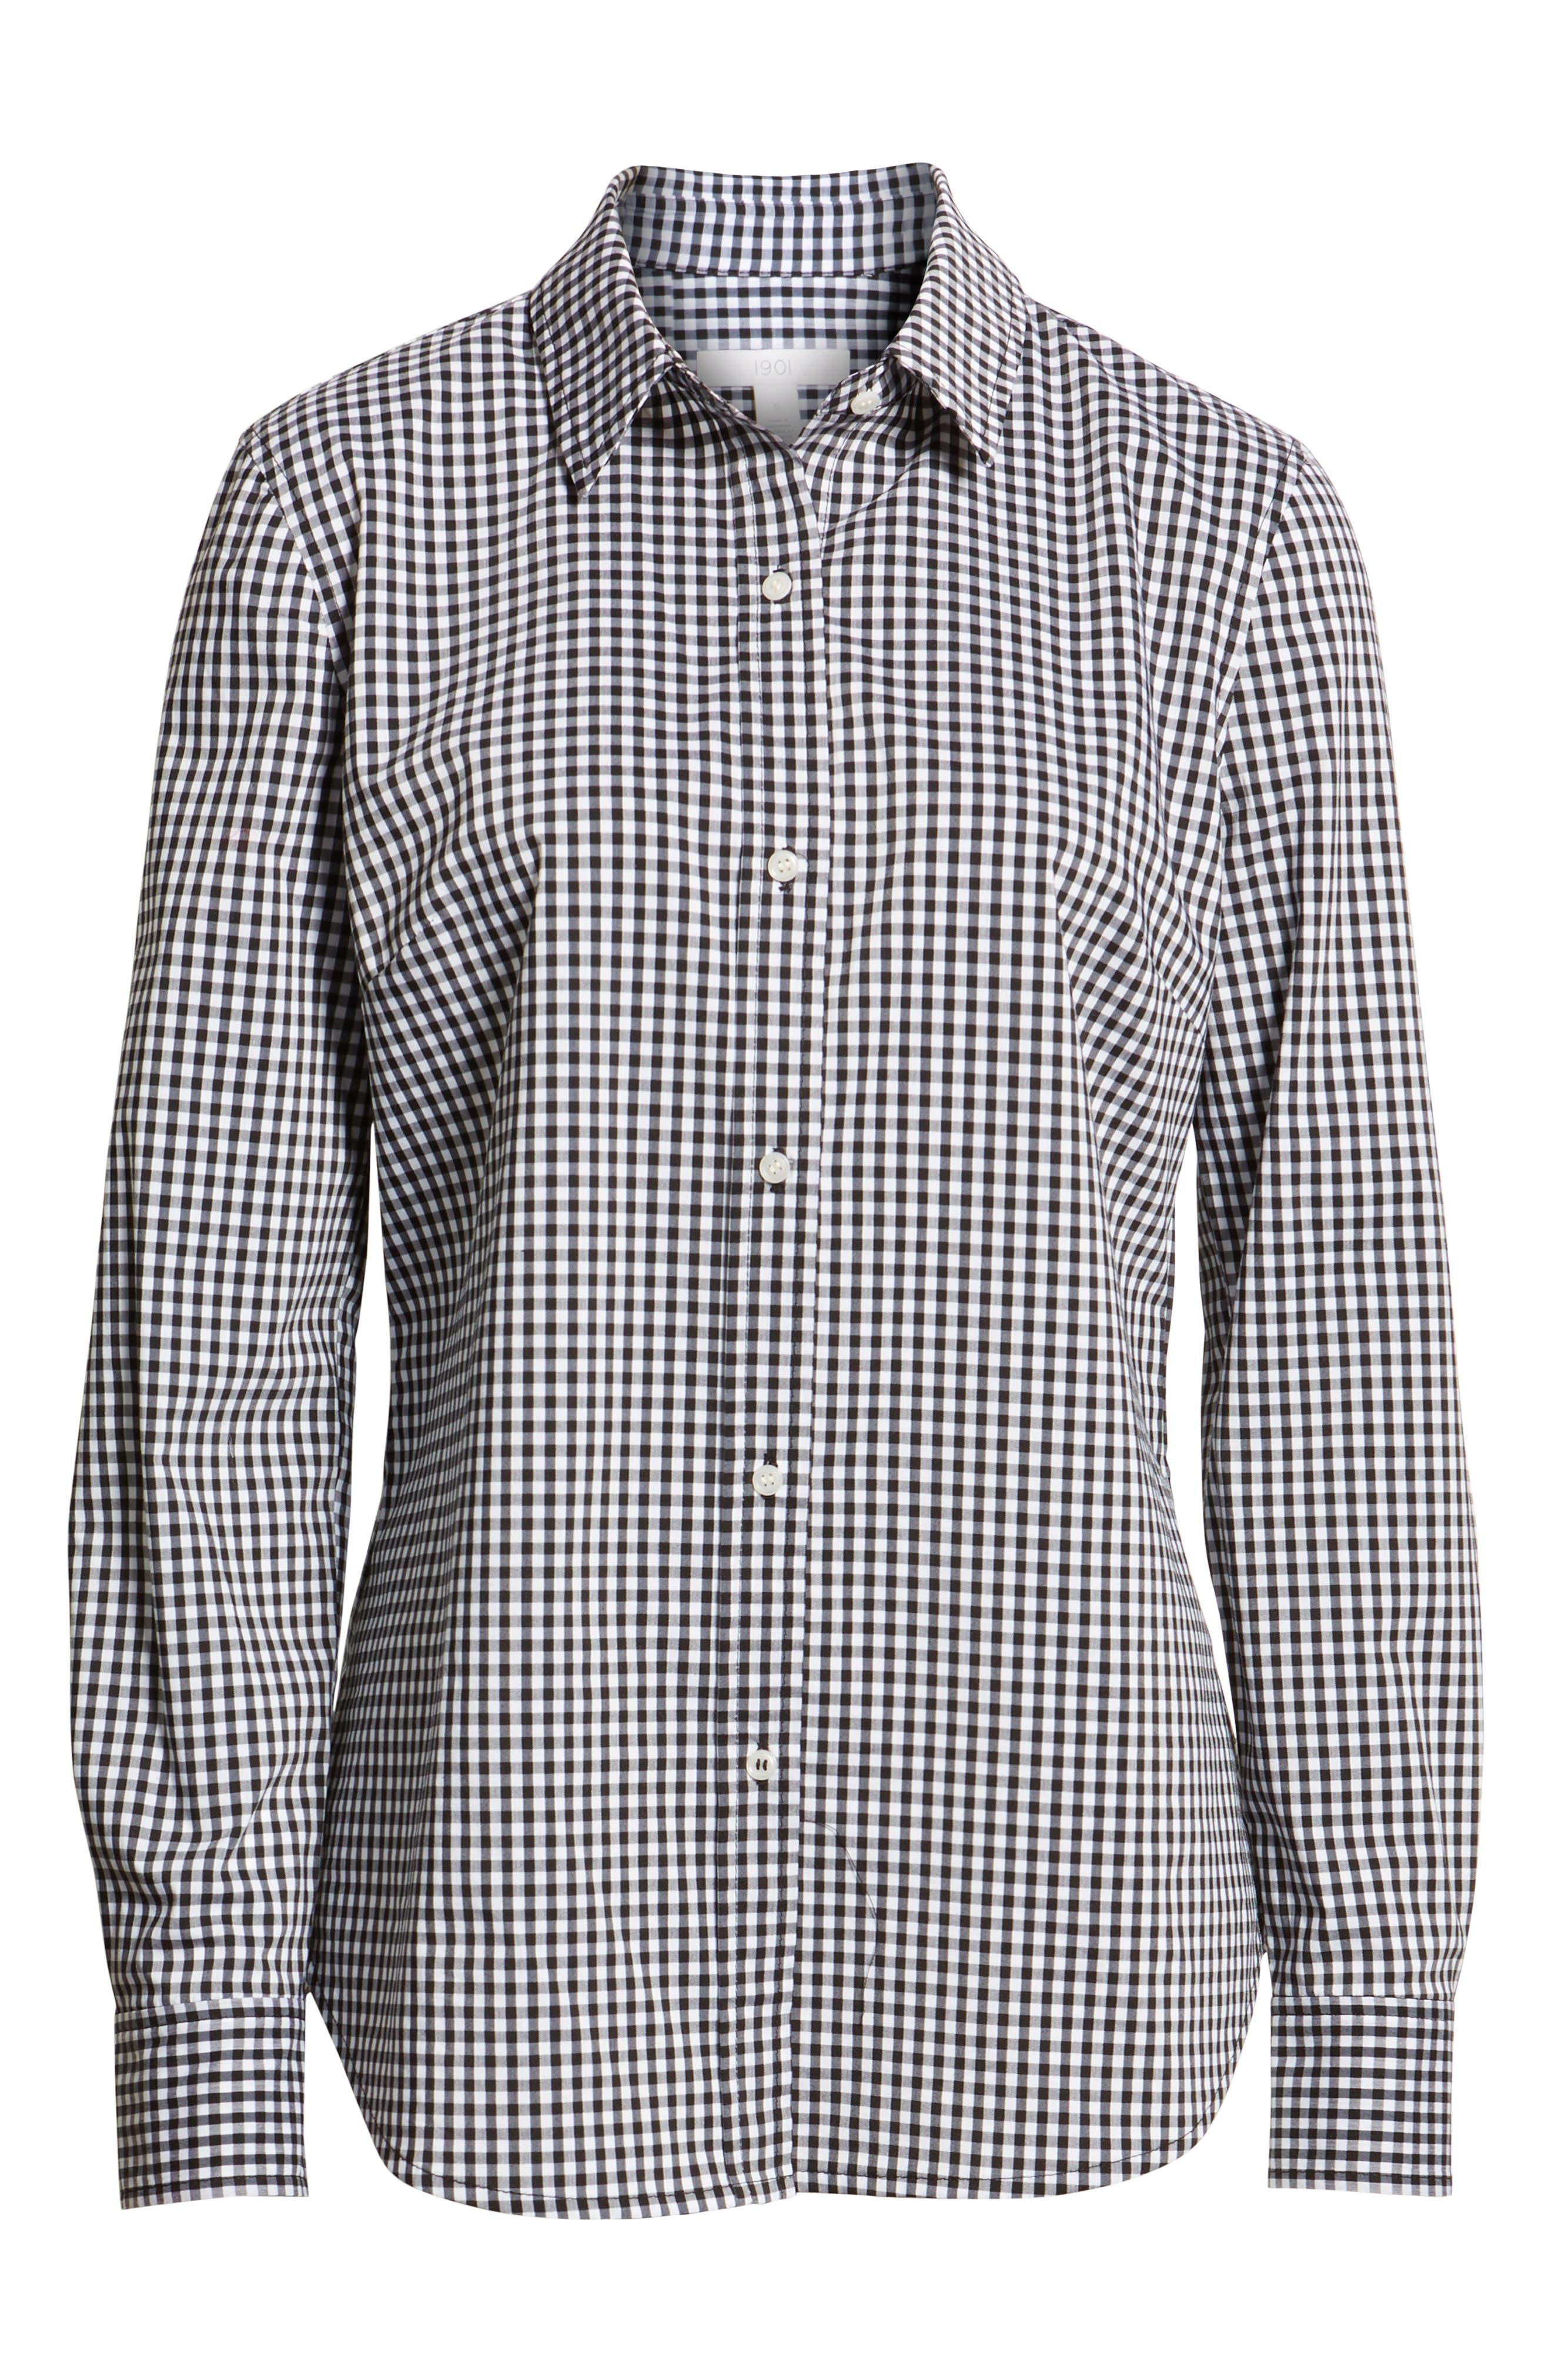 Stretch Cotton Blend Shirt,                             Alternate thumbnail 6, color,                             BLACK GINGHAM